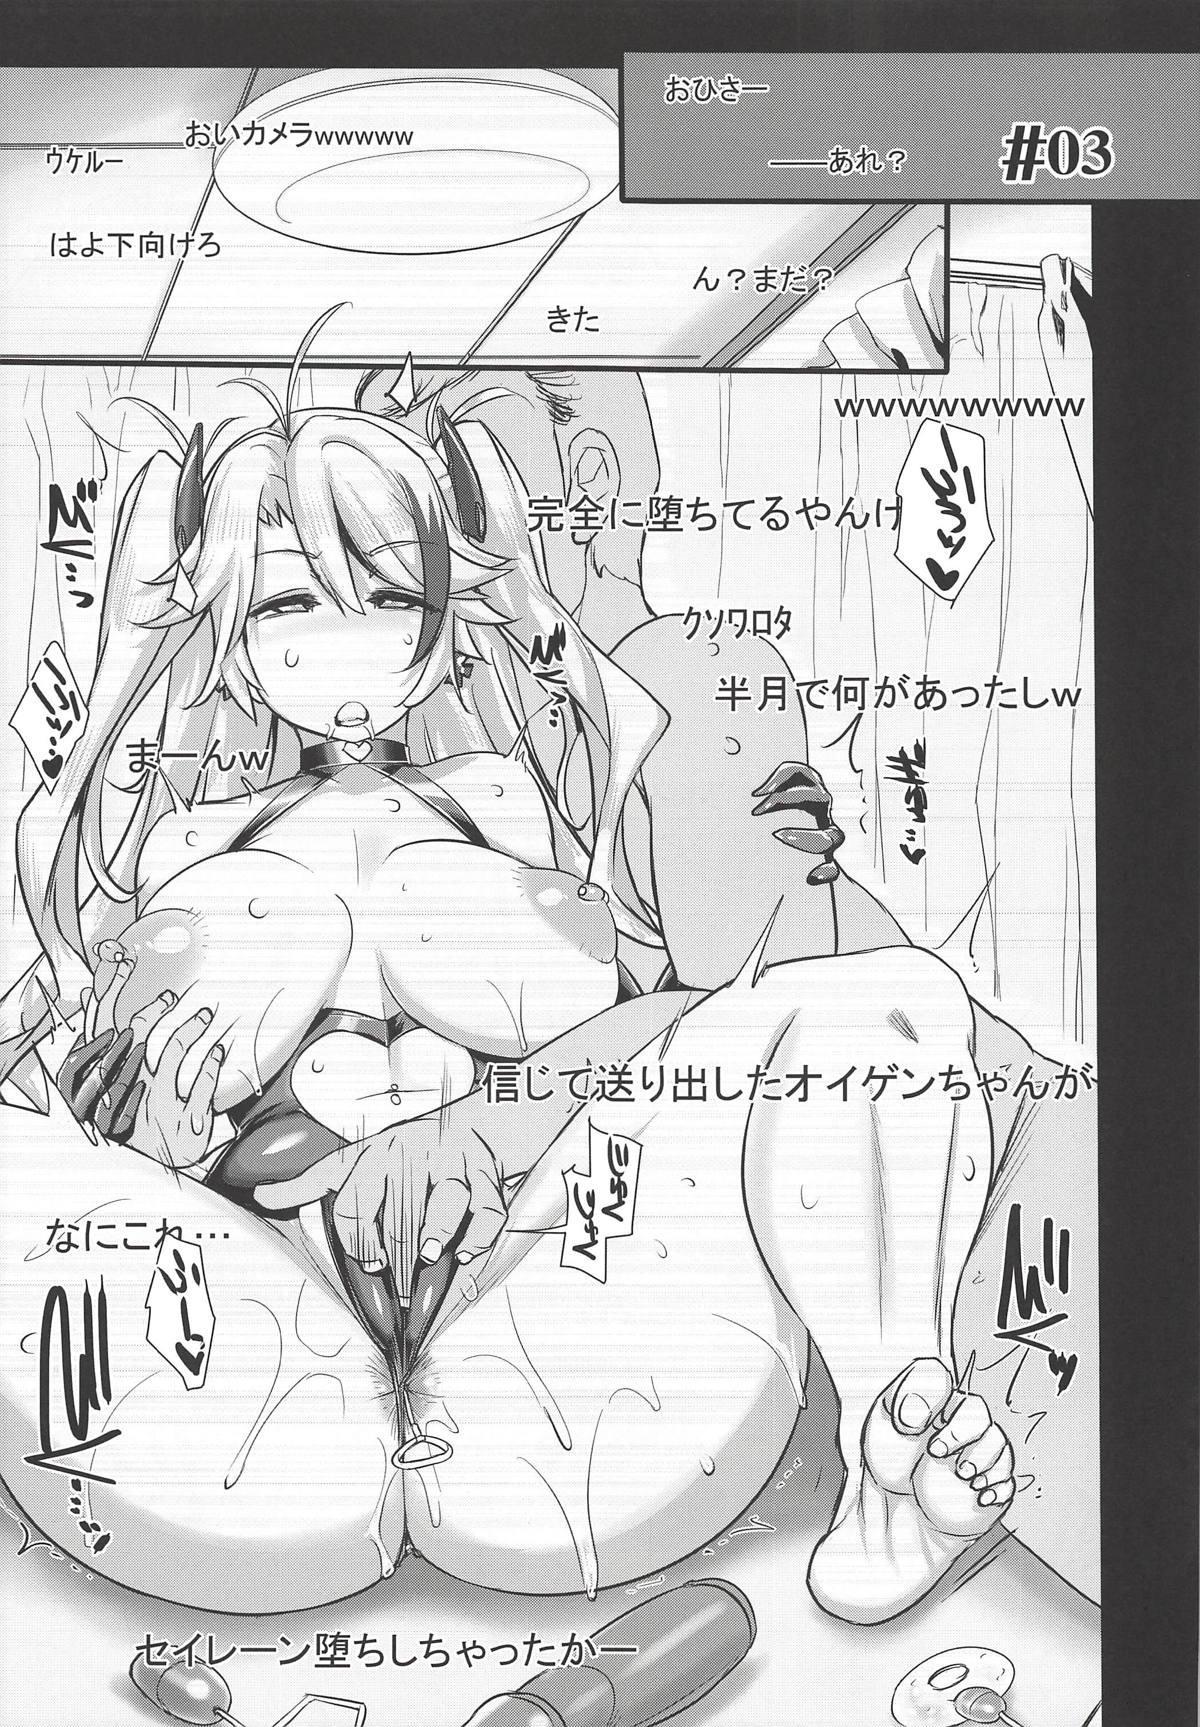 POV pert babe, Prinz Eugen. - Juujun Musume Hamedori Jikkyou Report 13